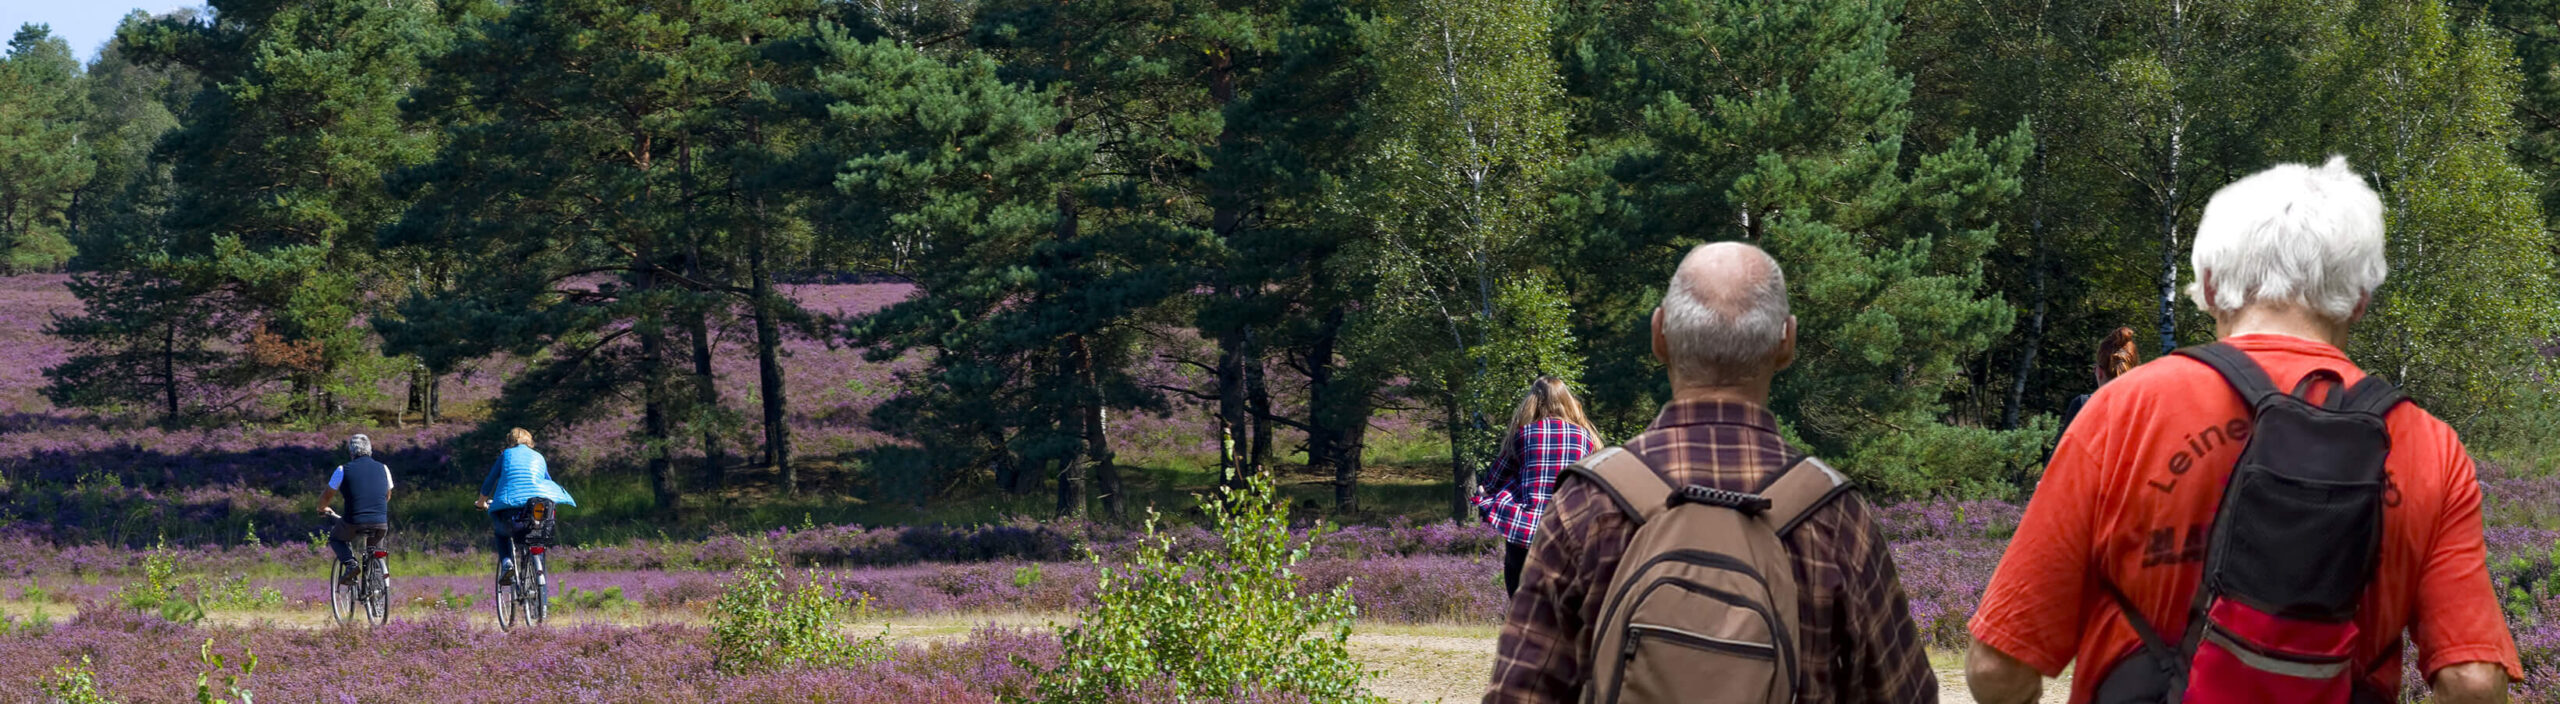 Naturcamping Lüneburger Heide - Region erkunden